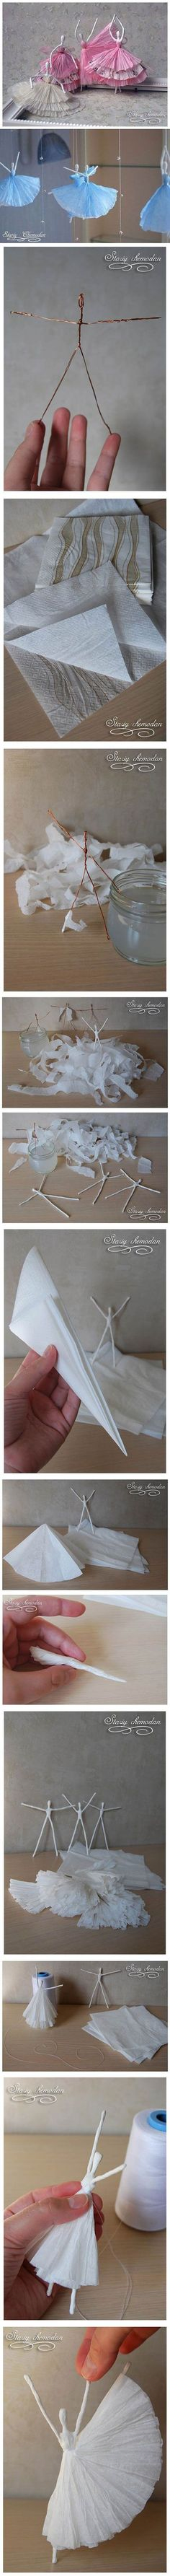 handmade balerina din servetele de hartie 1 Handmade balerine din servetele de hartie Tutorial